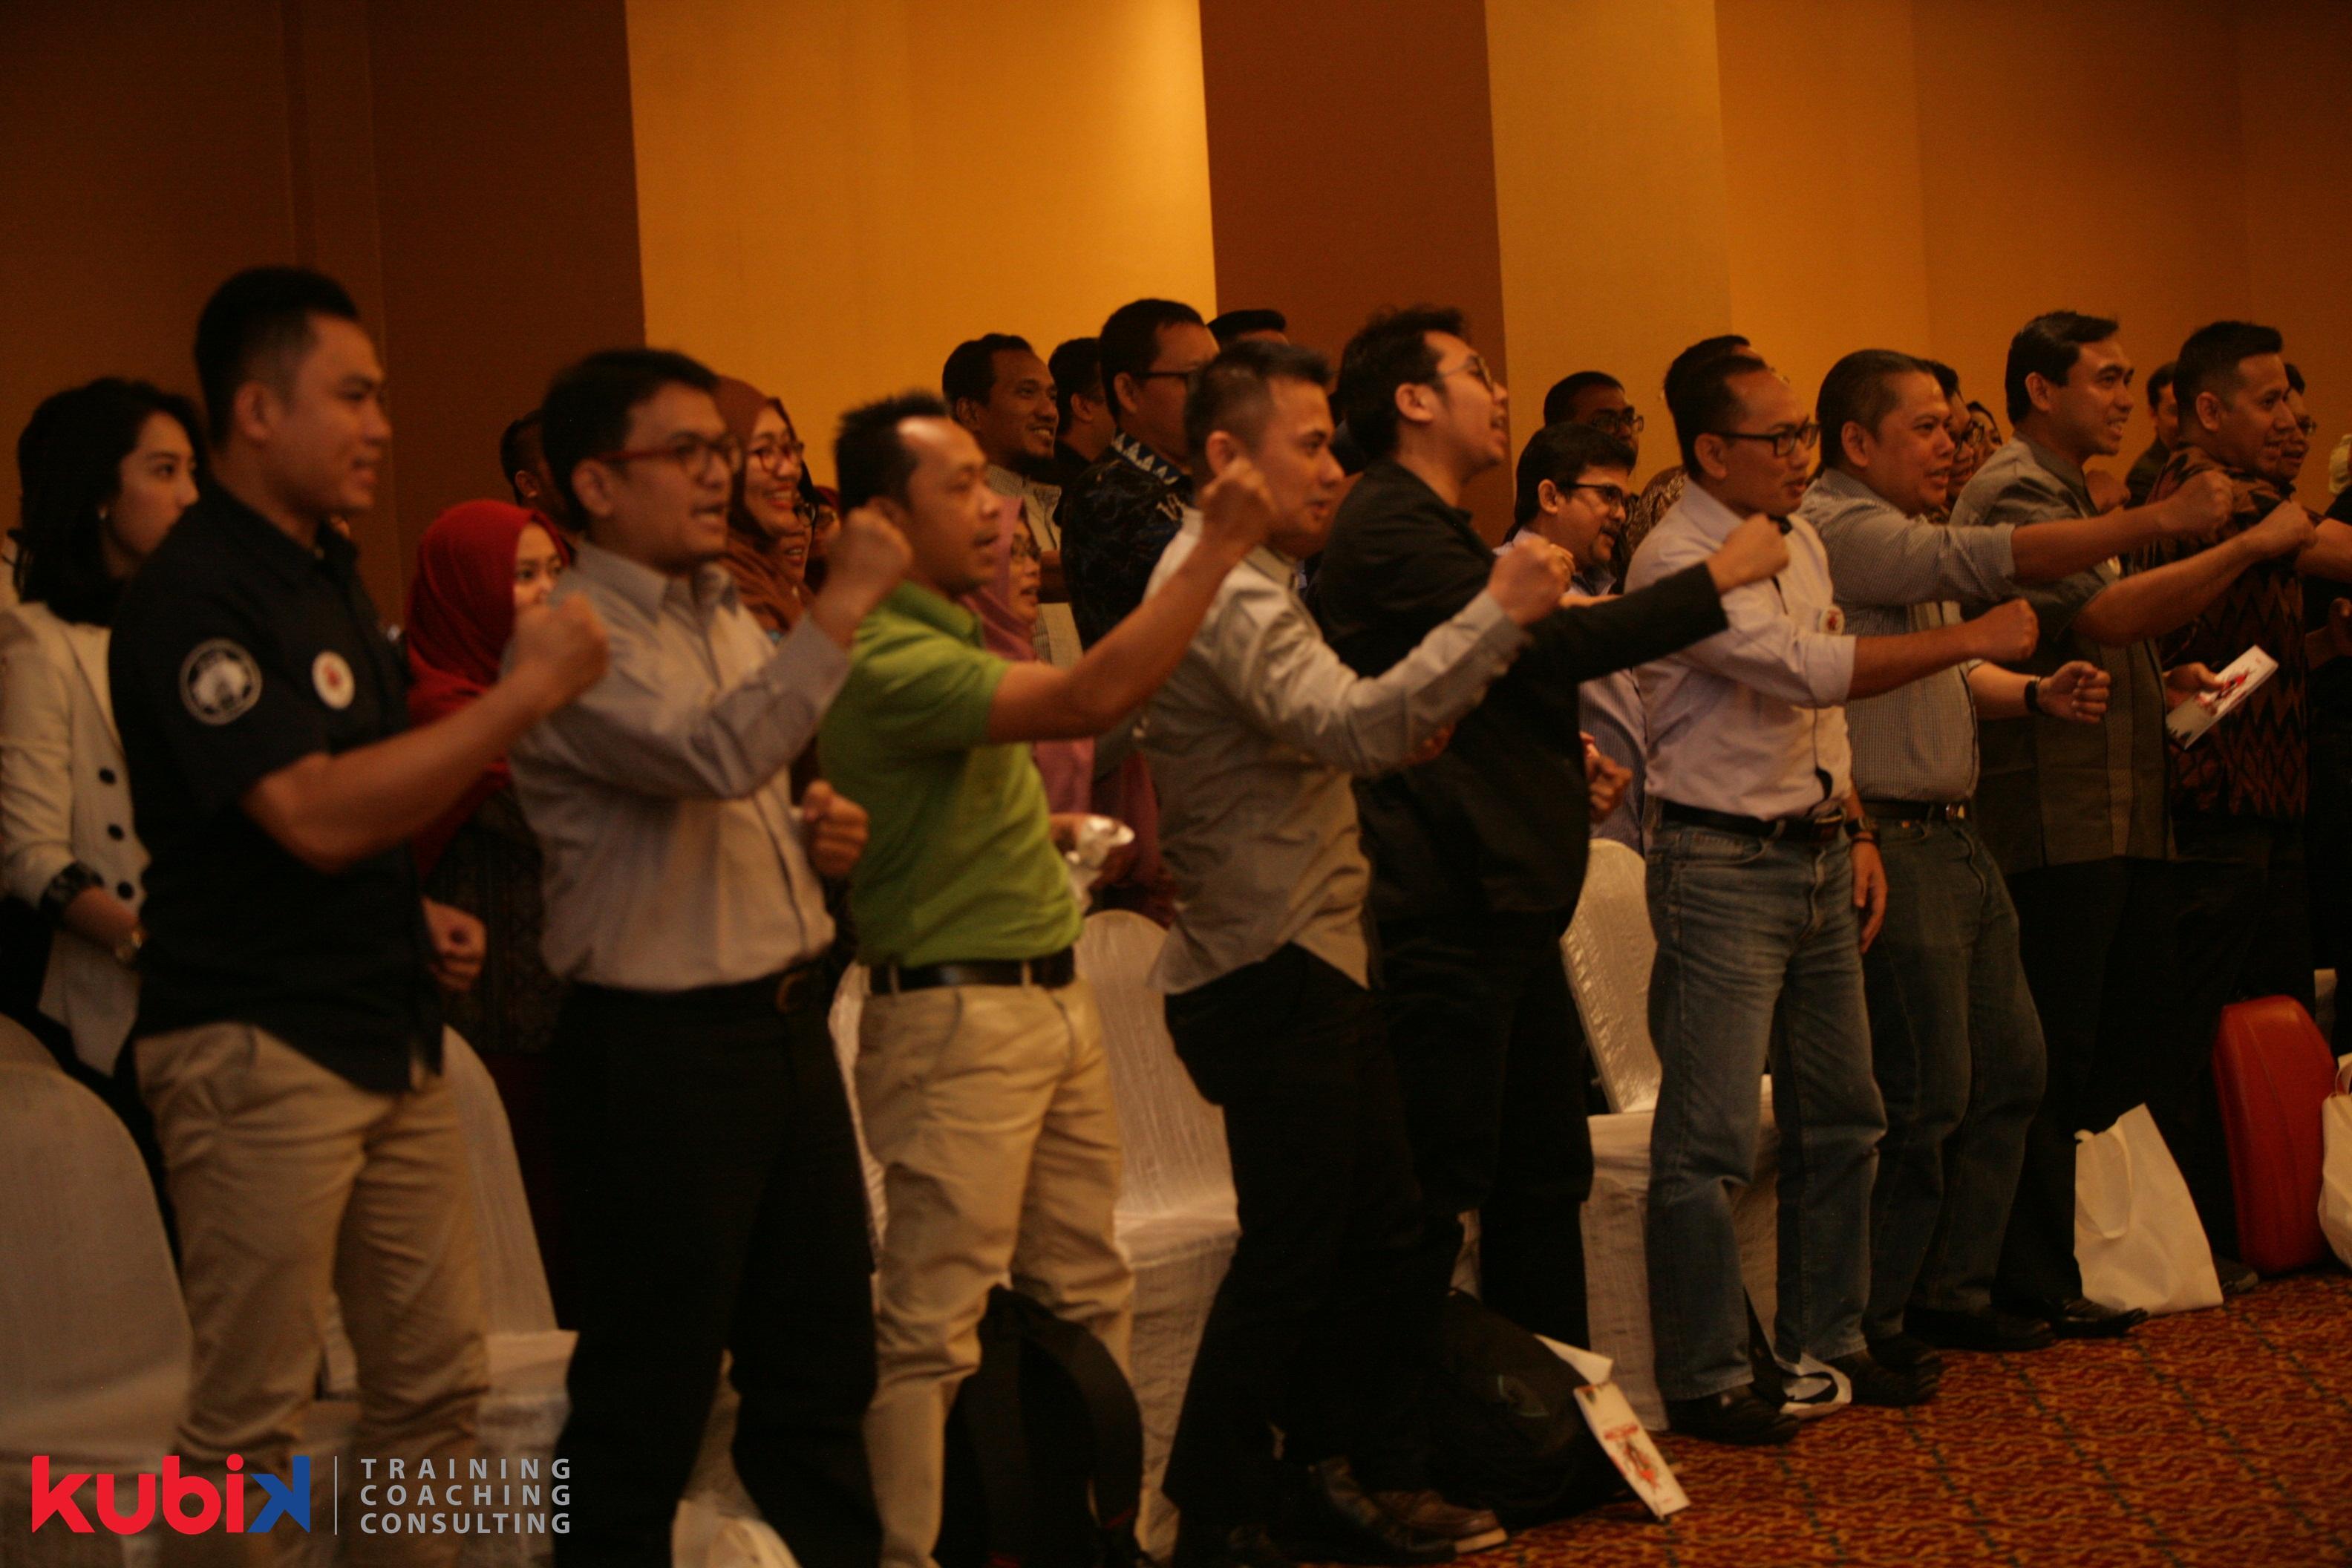 Kubik Leadership Training: Managerialship Vs Leadership